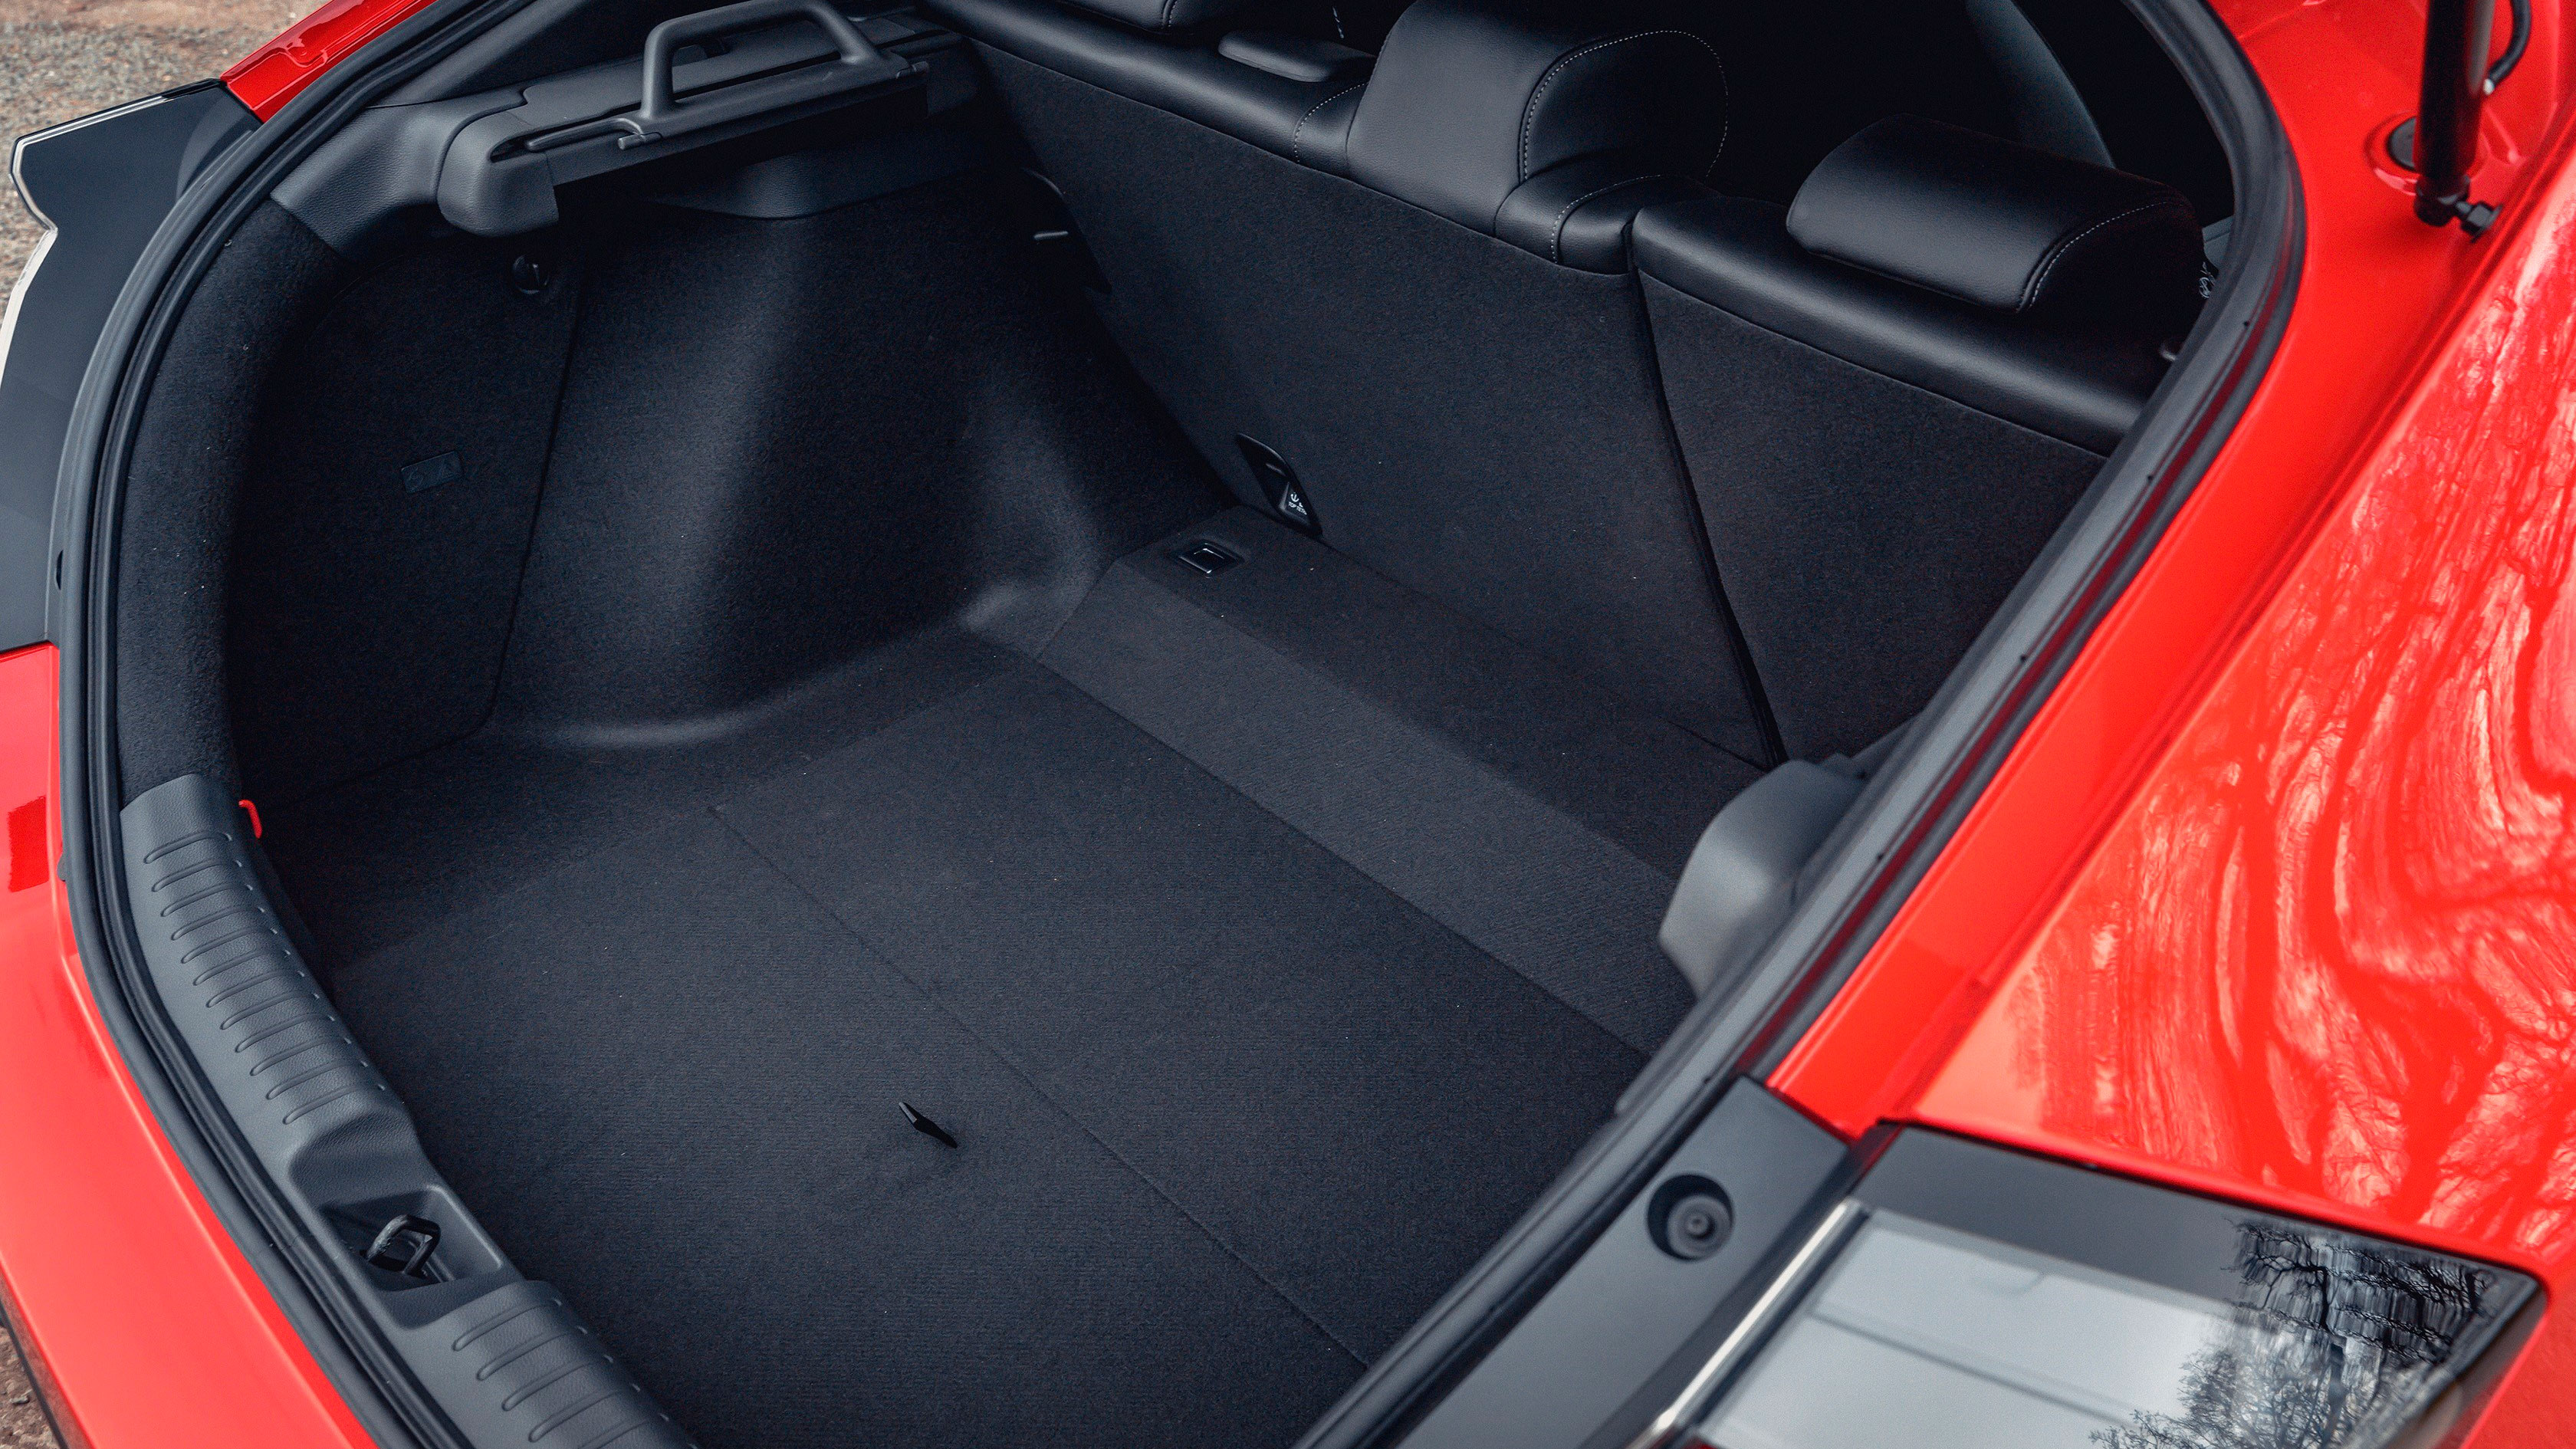 Honda Civic 1.0 vtec turbo boot